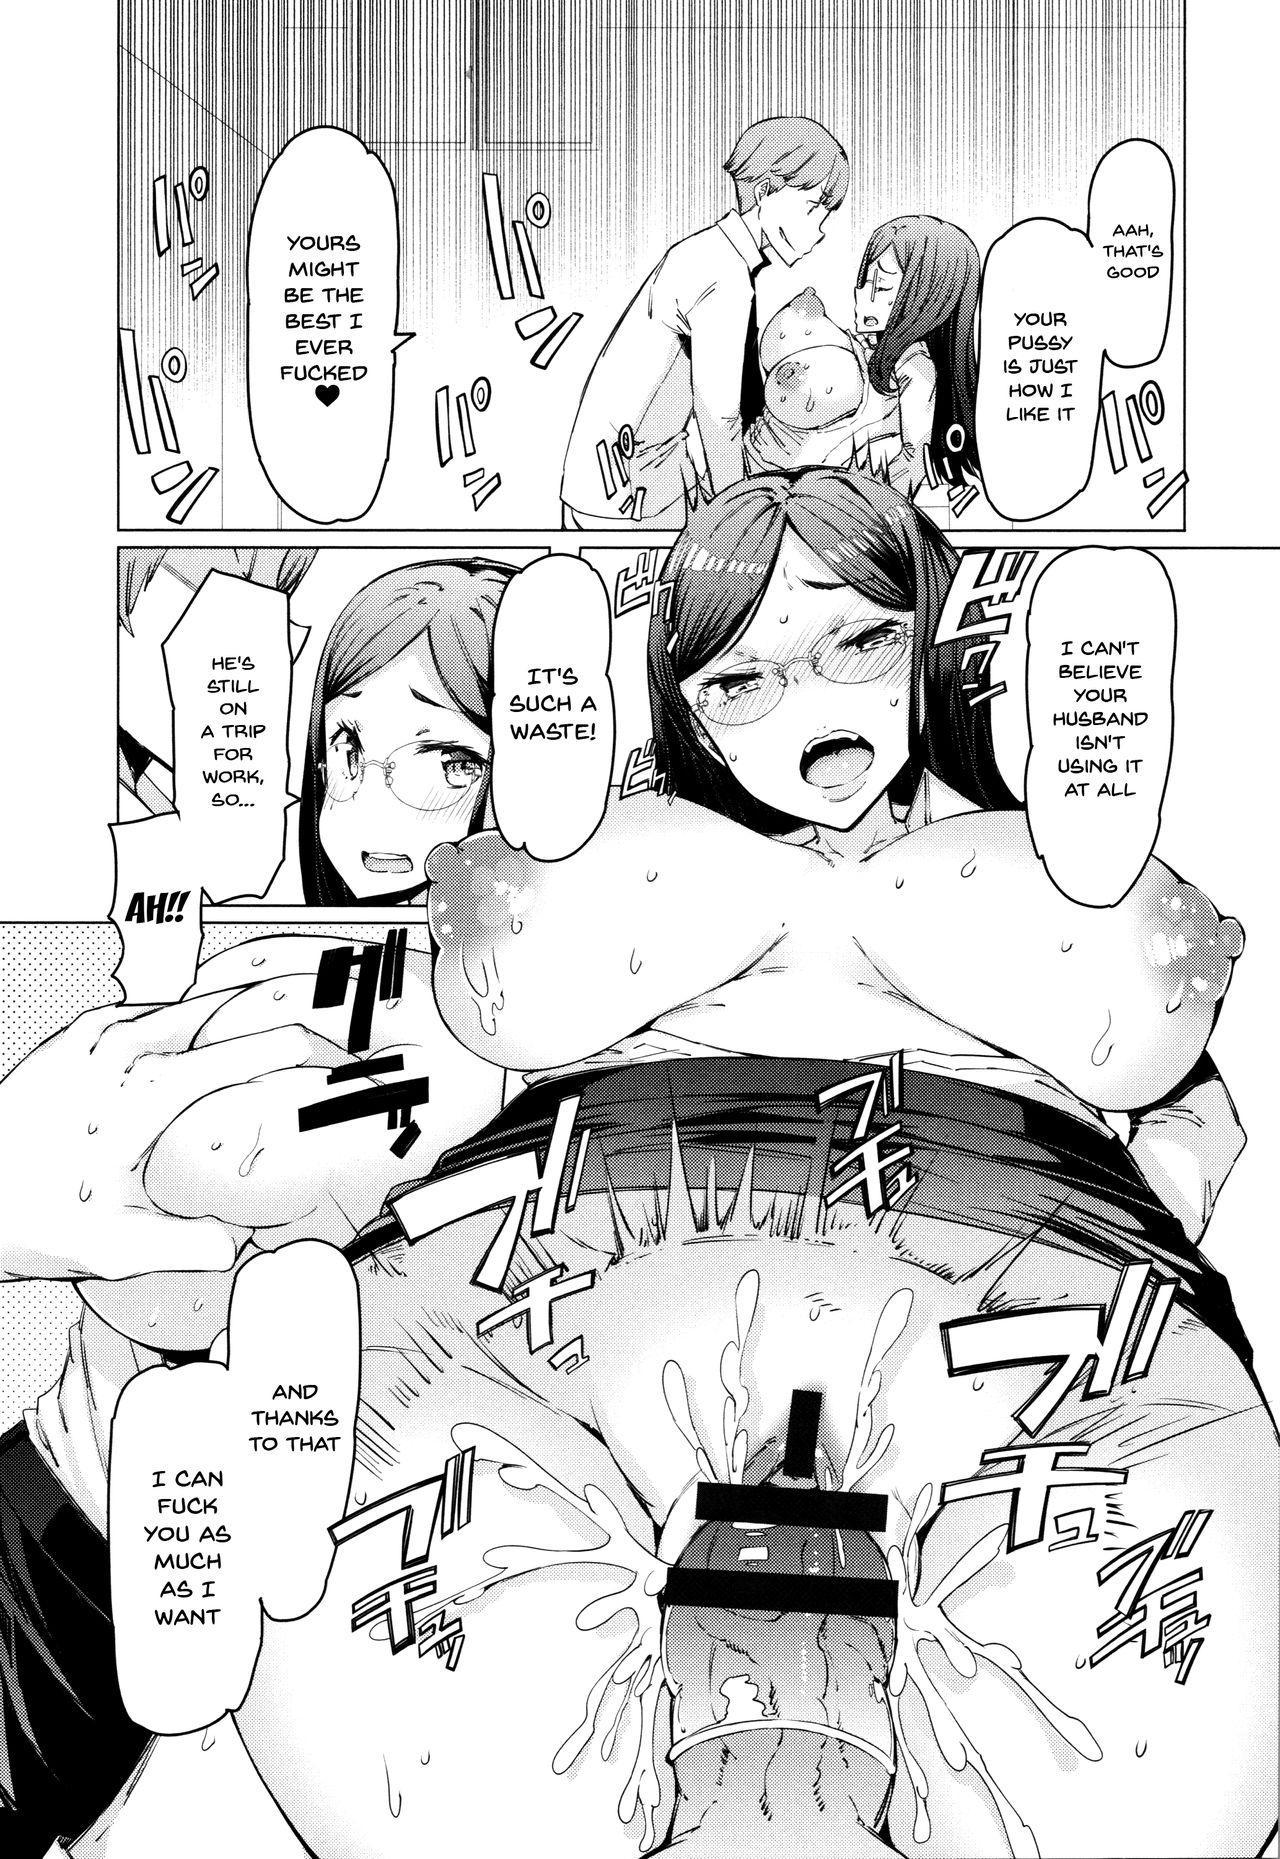 Hitozuma ga Ero Sugite Shigoto ni Naranai! | These Housewives Are Too Lewd I Can't Help It! 42